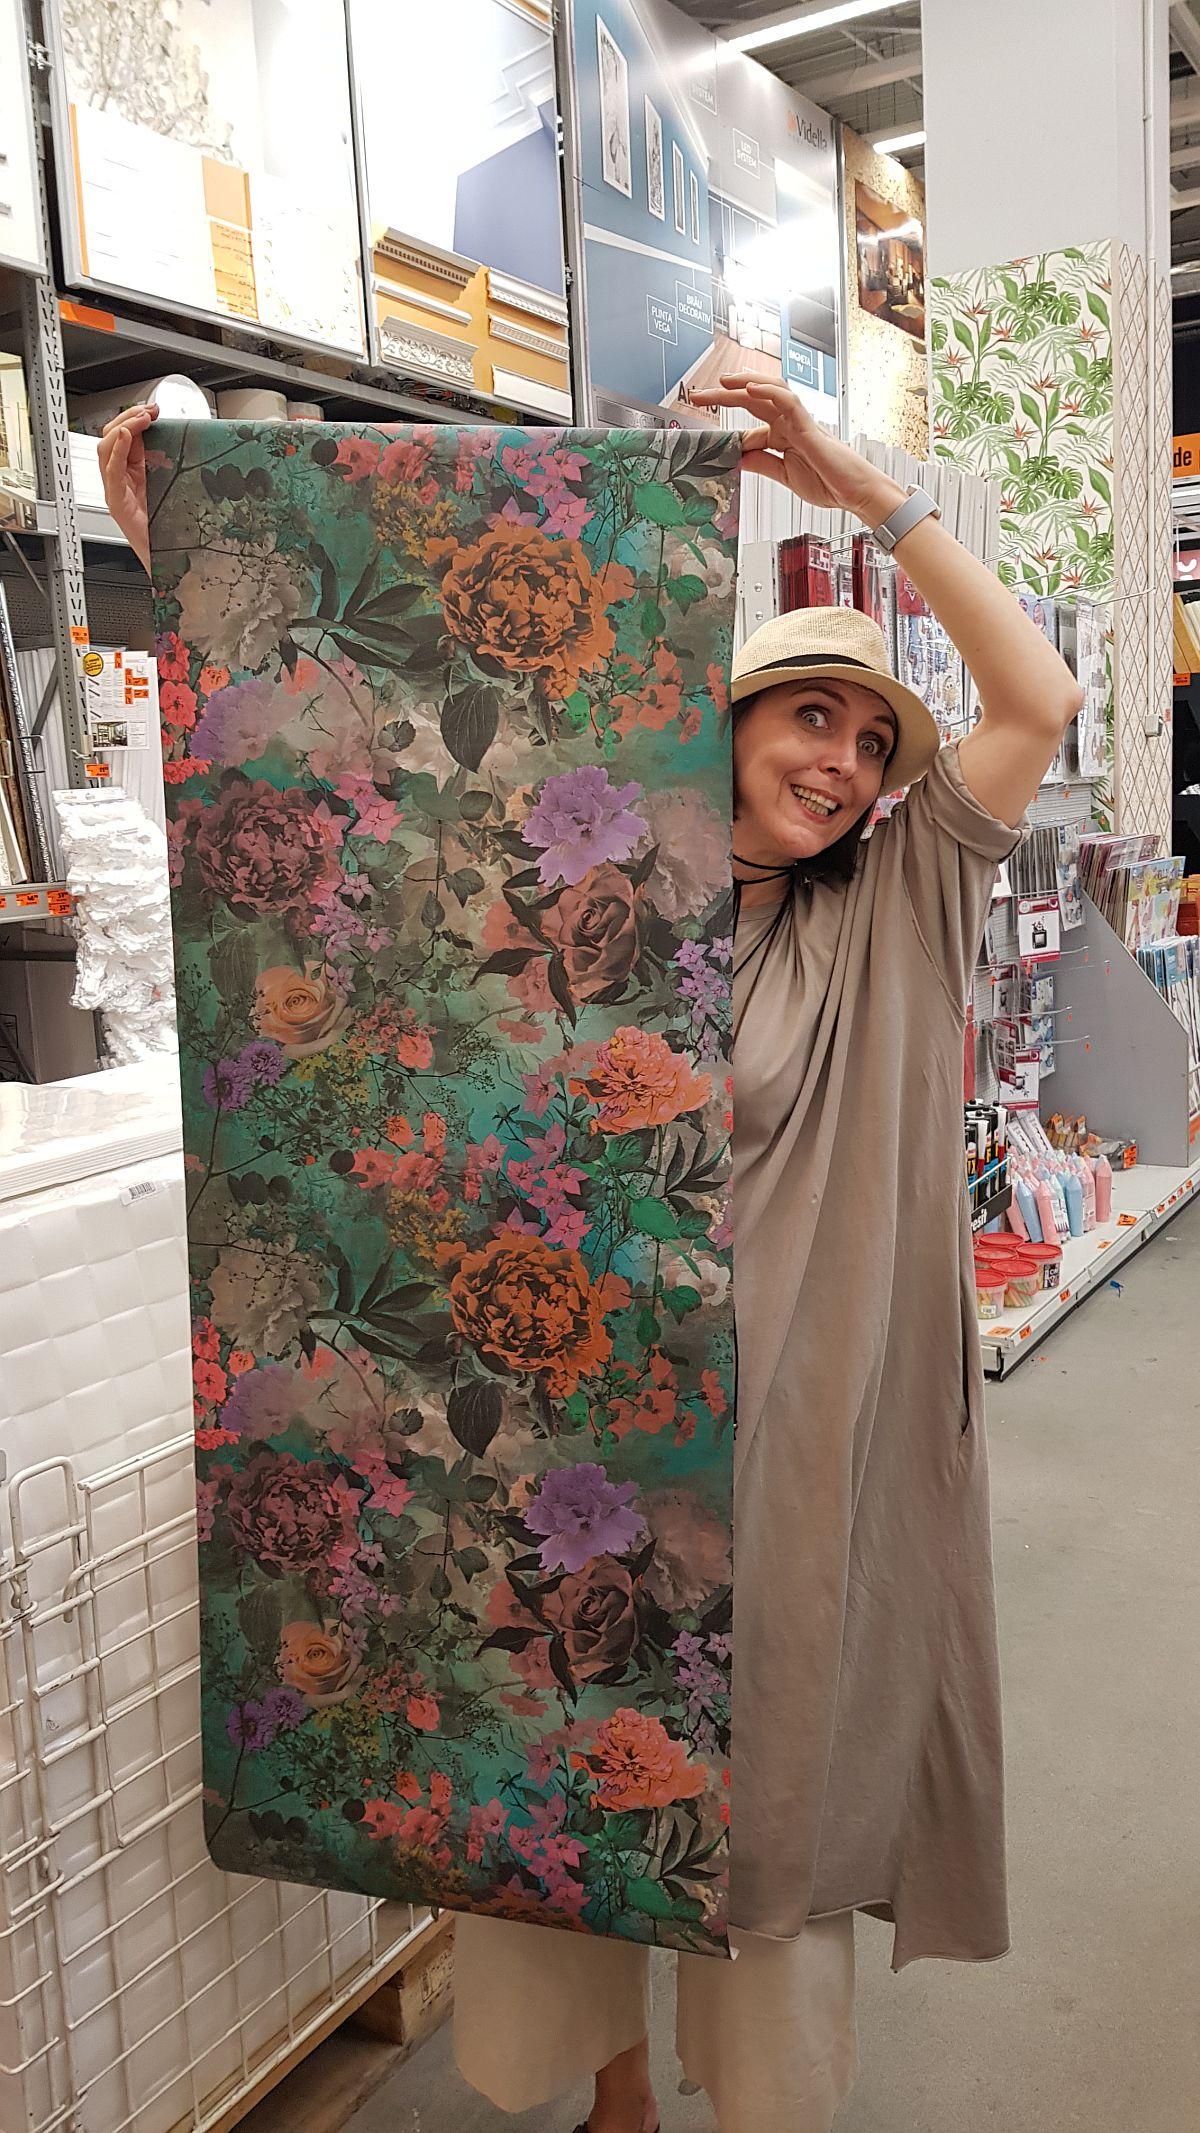 adelaparvu.com despre decoratiuni la pret bun in magazine, Hornbach (1)